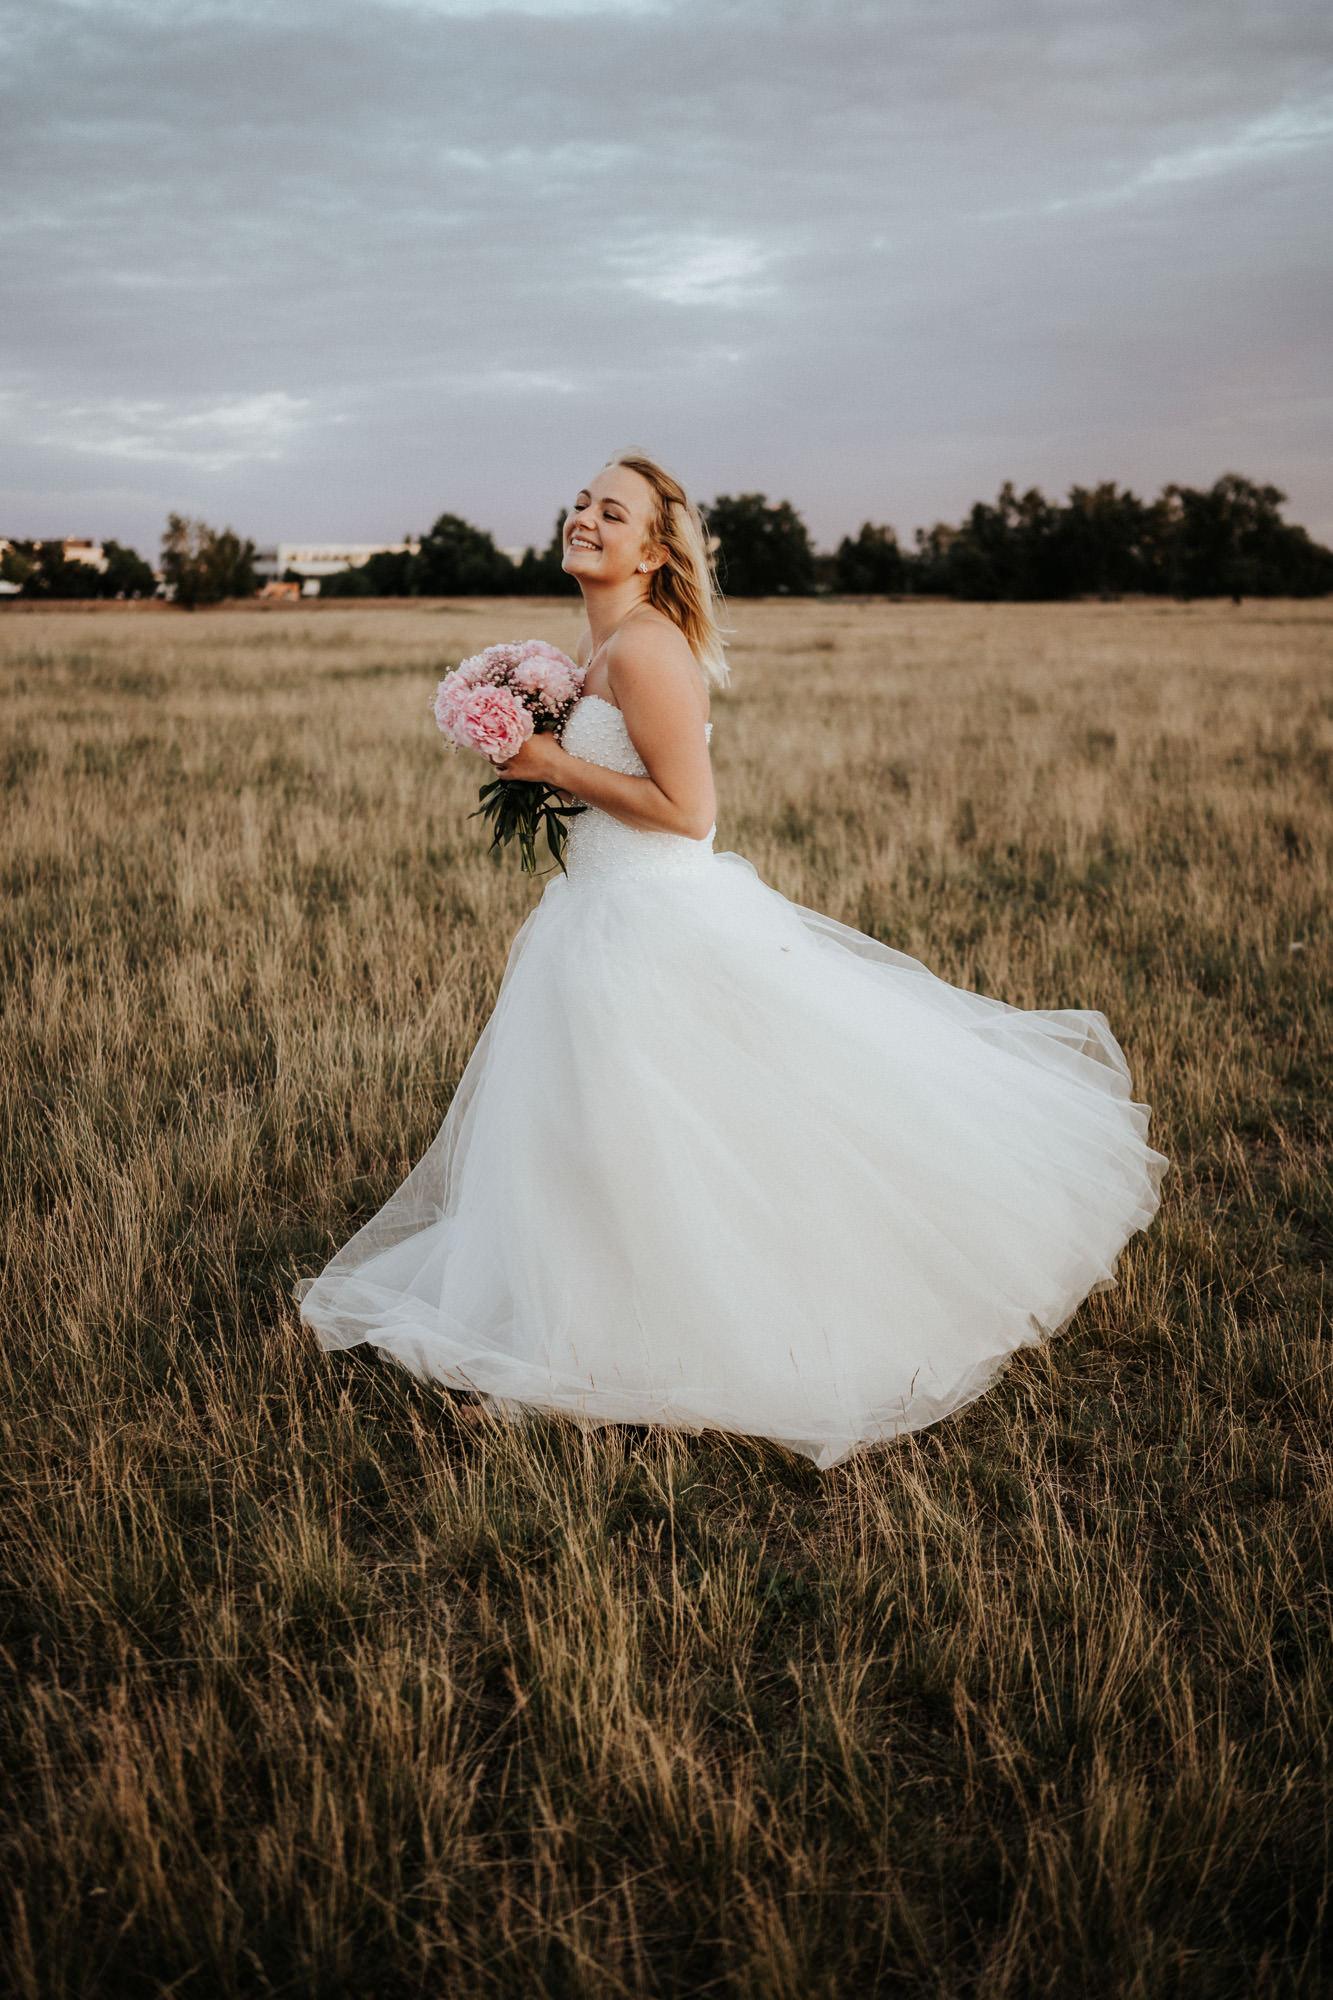 waltsmedia-hochzeitsreportage-after-wedding-shooting-berlin-24